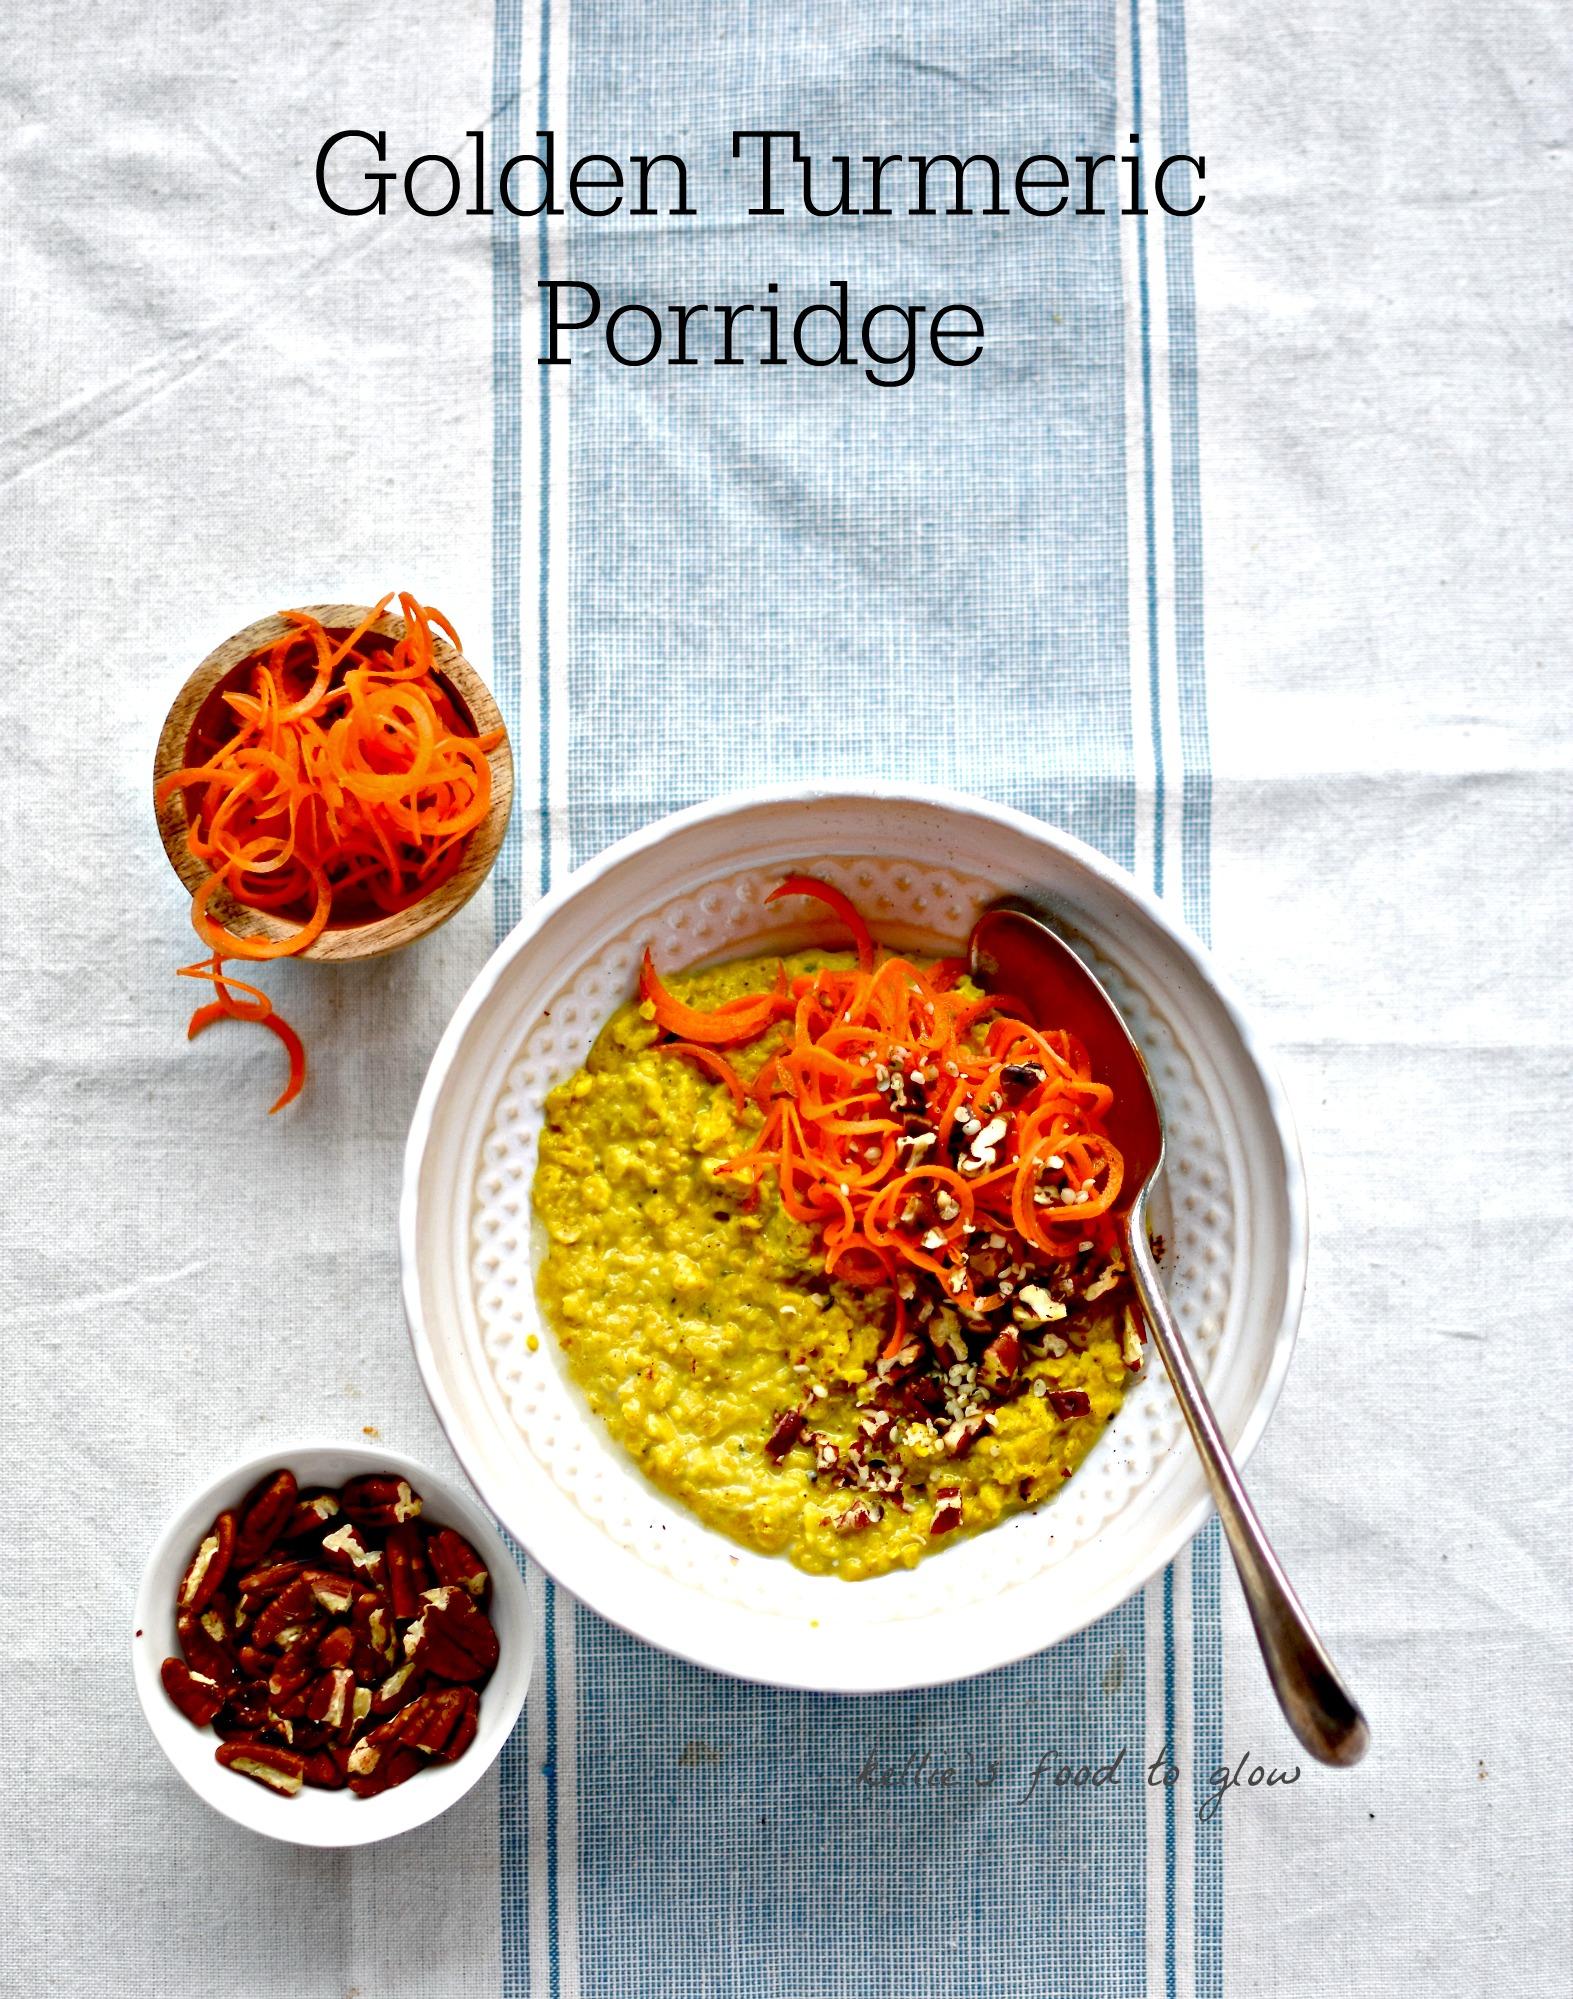 how to make good porridge